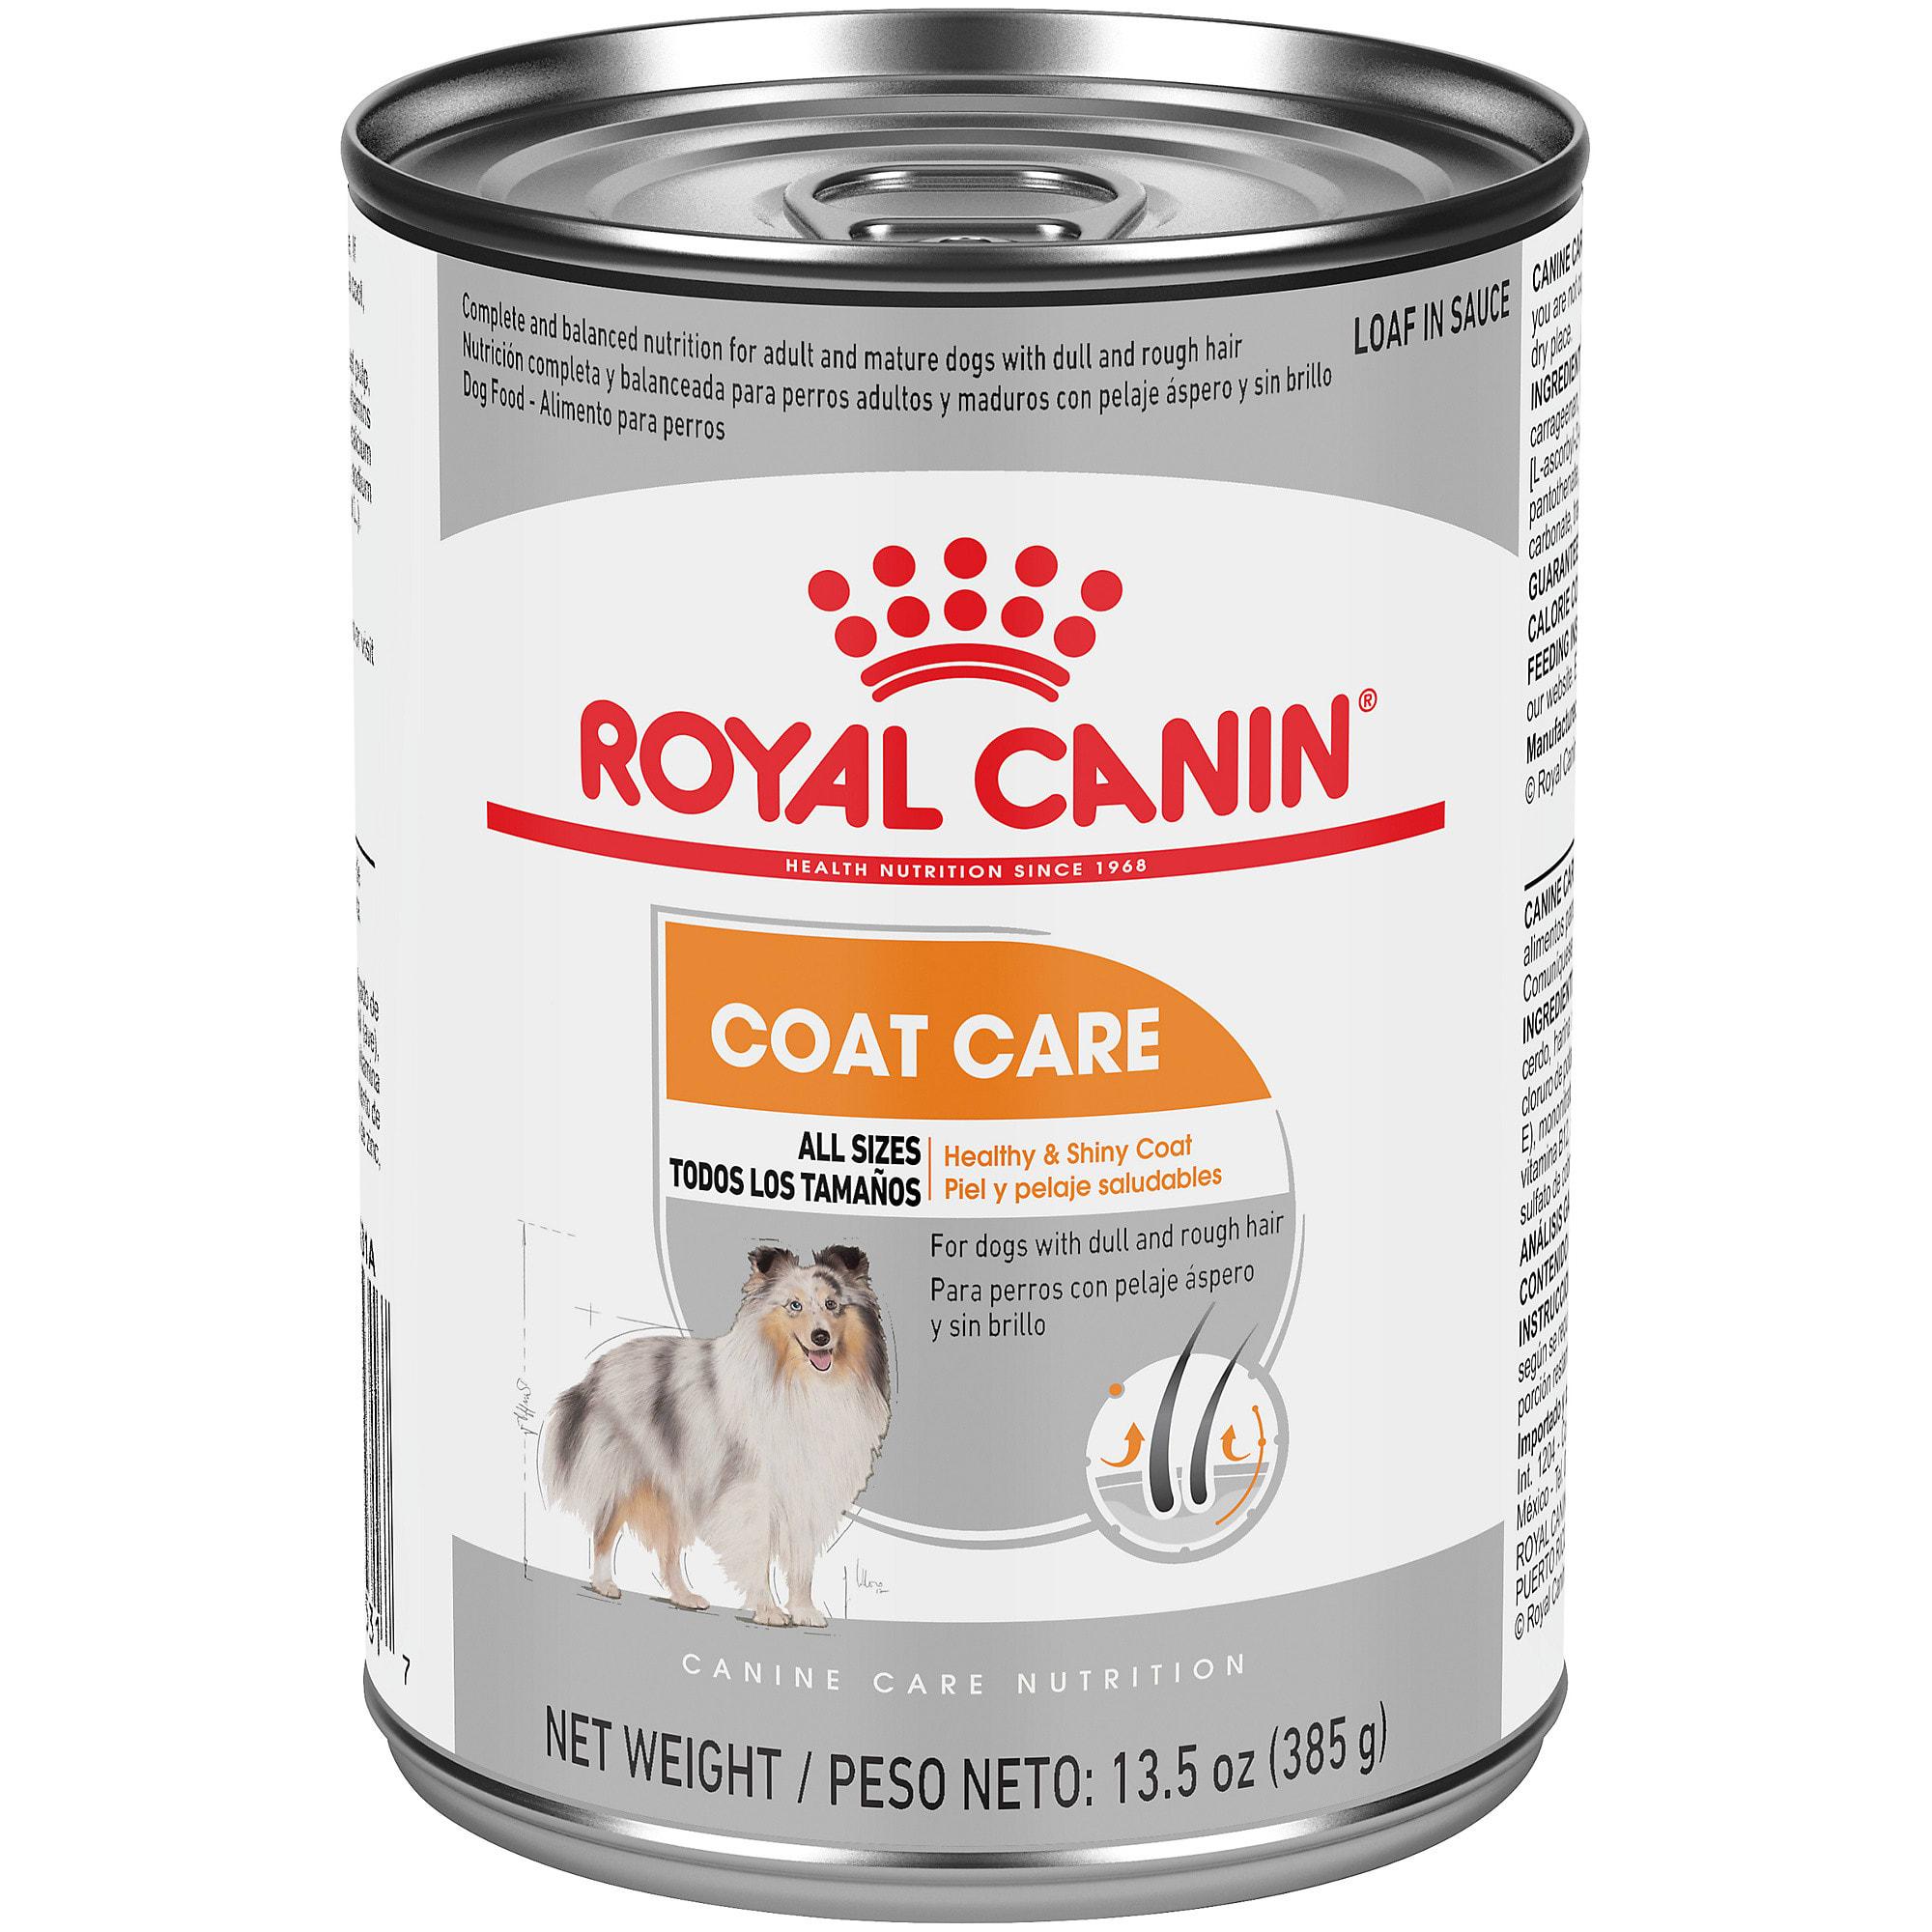 Royal Canin Canine Care Nutrition Coat